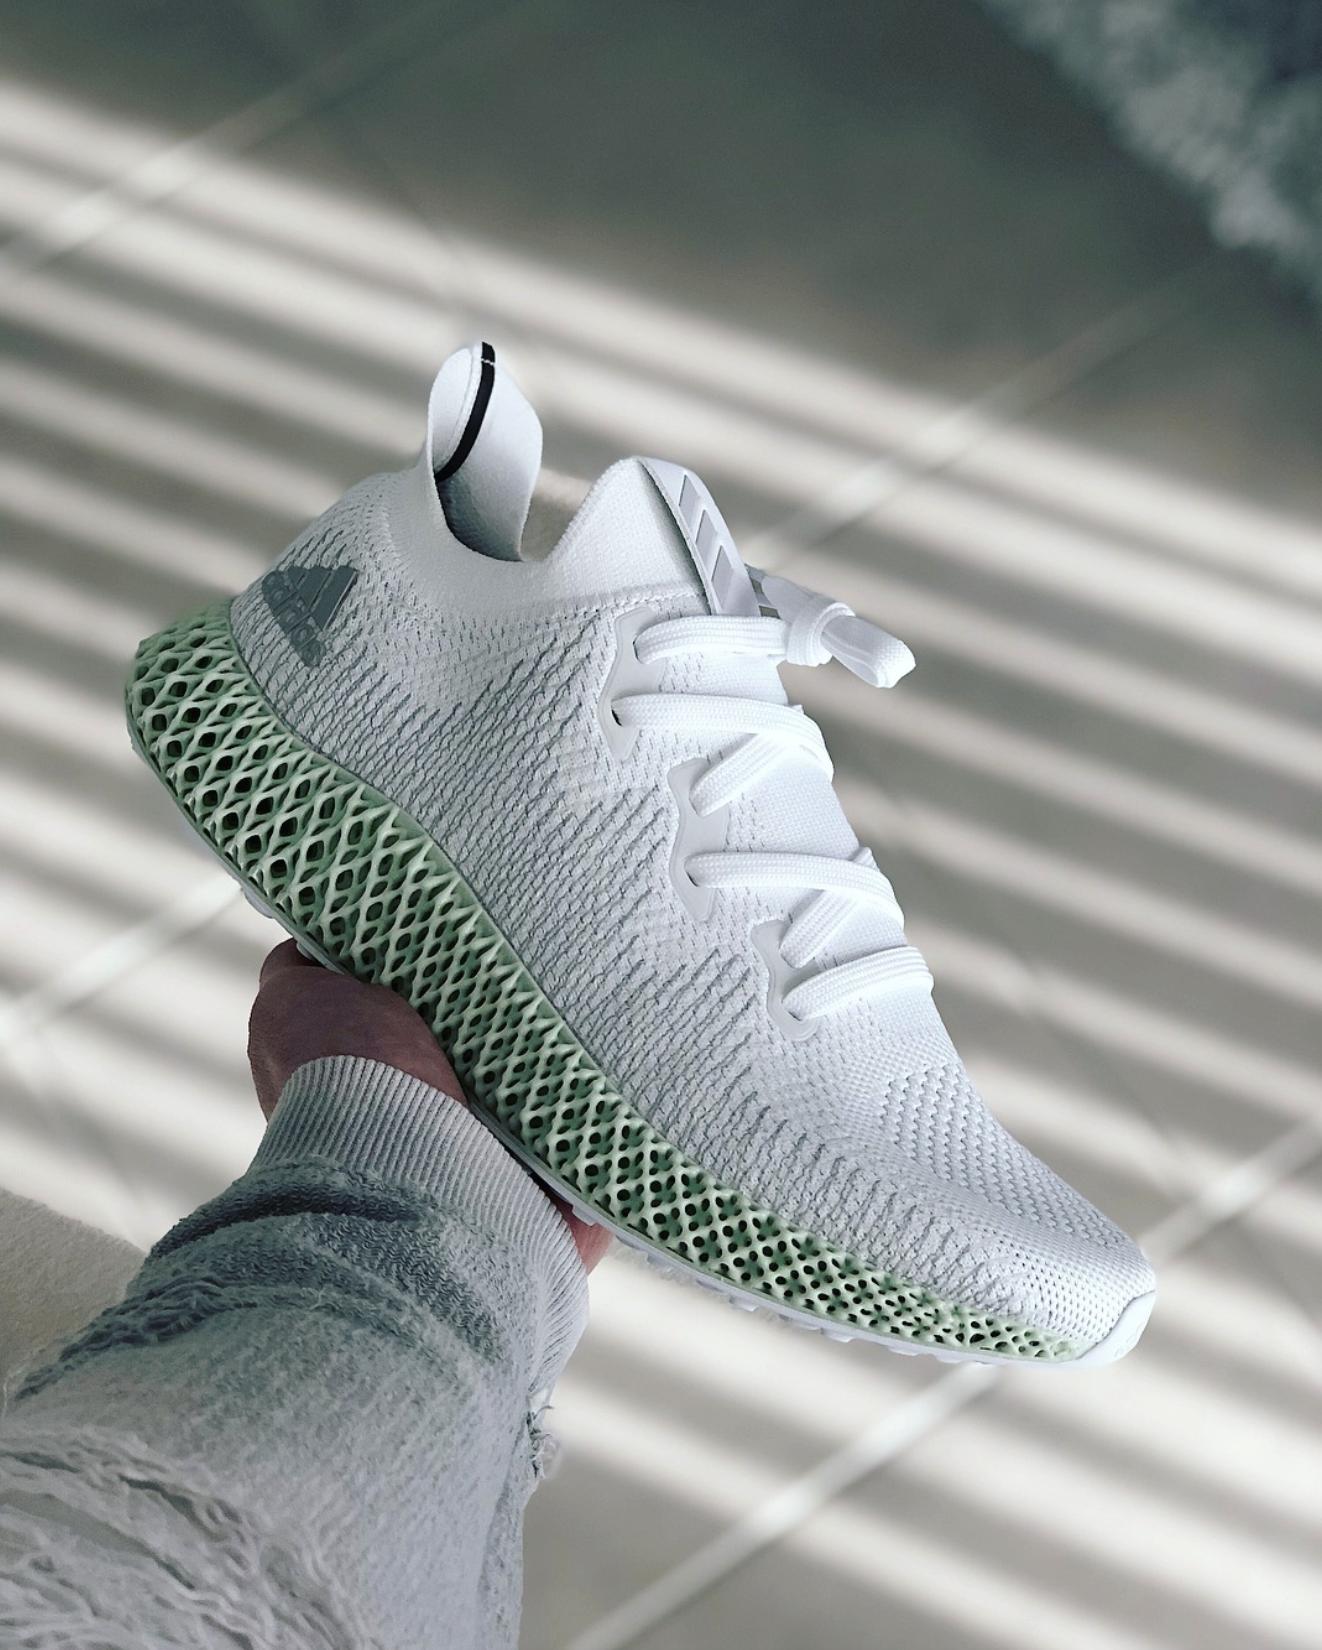 888e7cfd8 Still looking for Adidas Futurecraft 4D Sneakers  ▻ Shop at KLEKT now.  (Click on Link)  klekttakeover 📸  frieze43